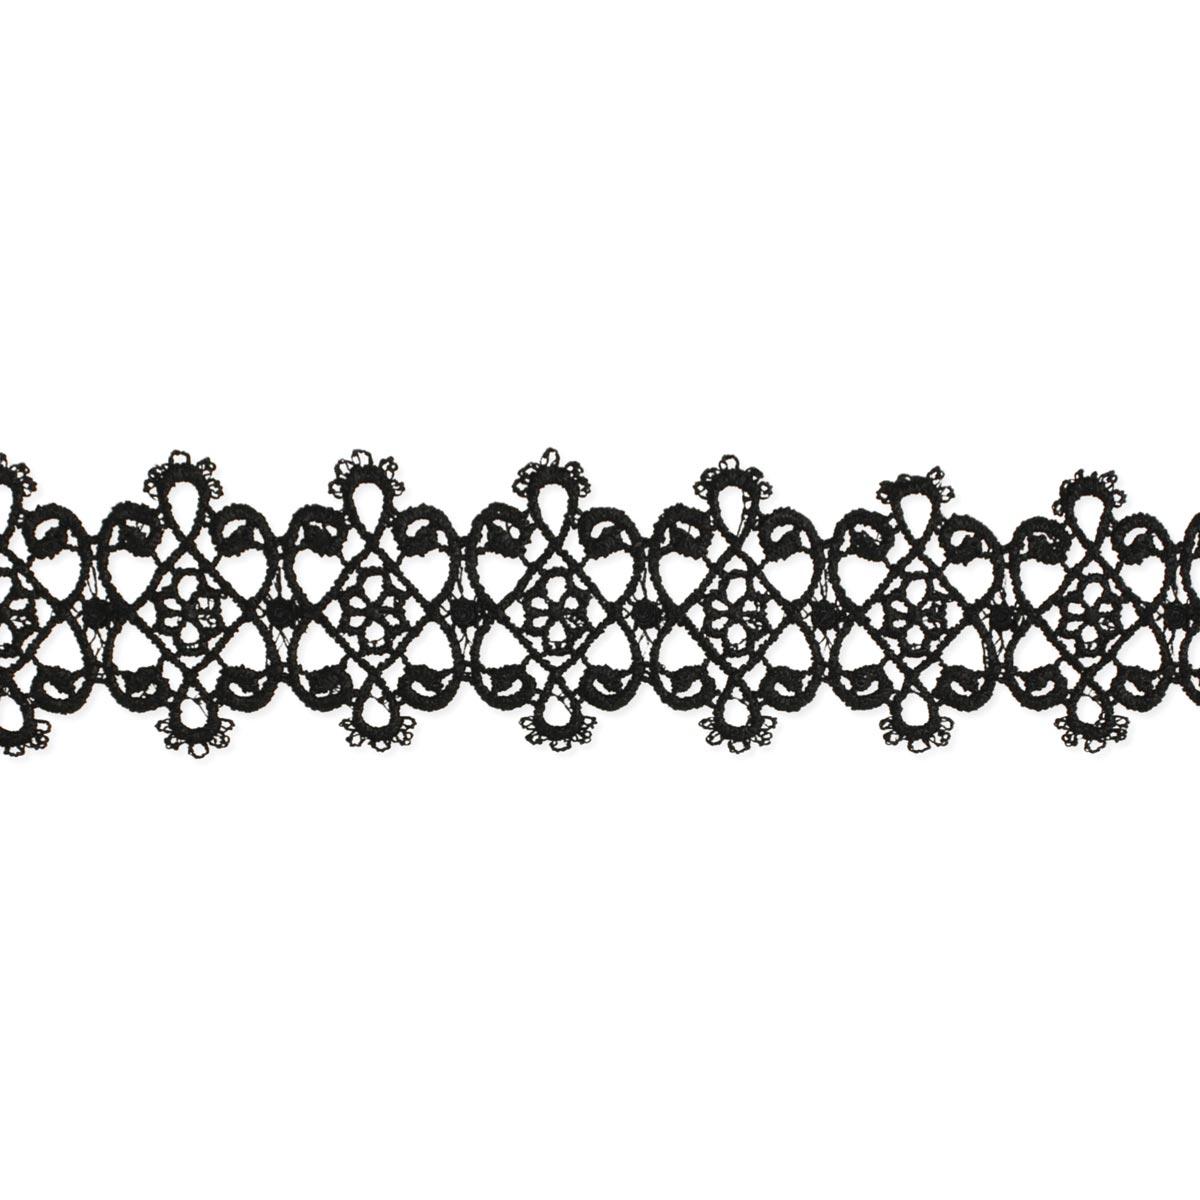 Black Victorian Crochet Choker Necklace